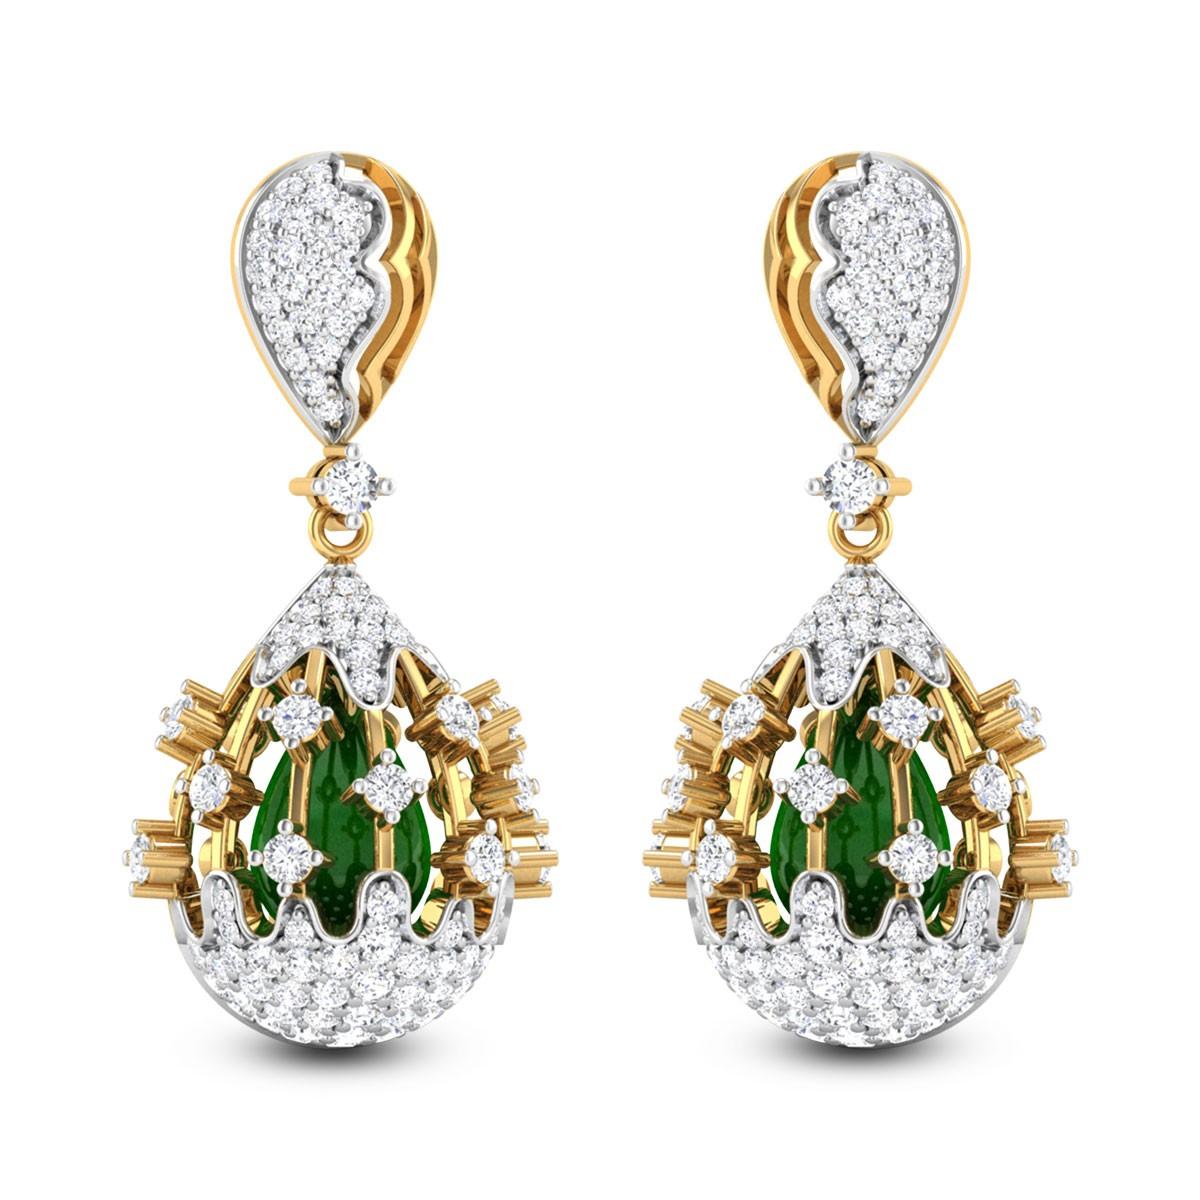 Morpheus Emerald and Diamond Earrings